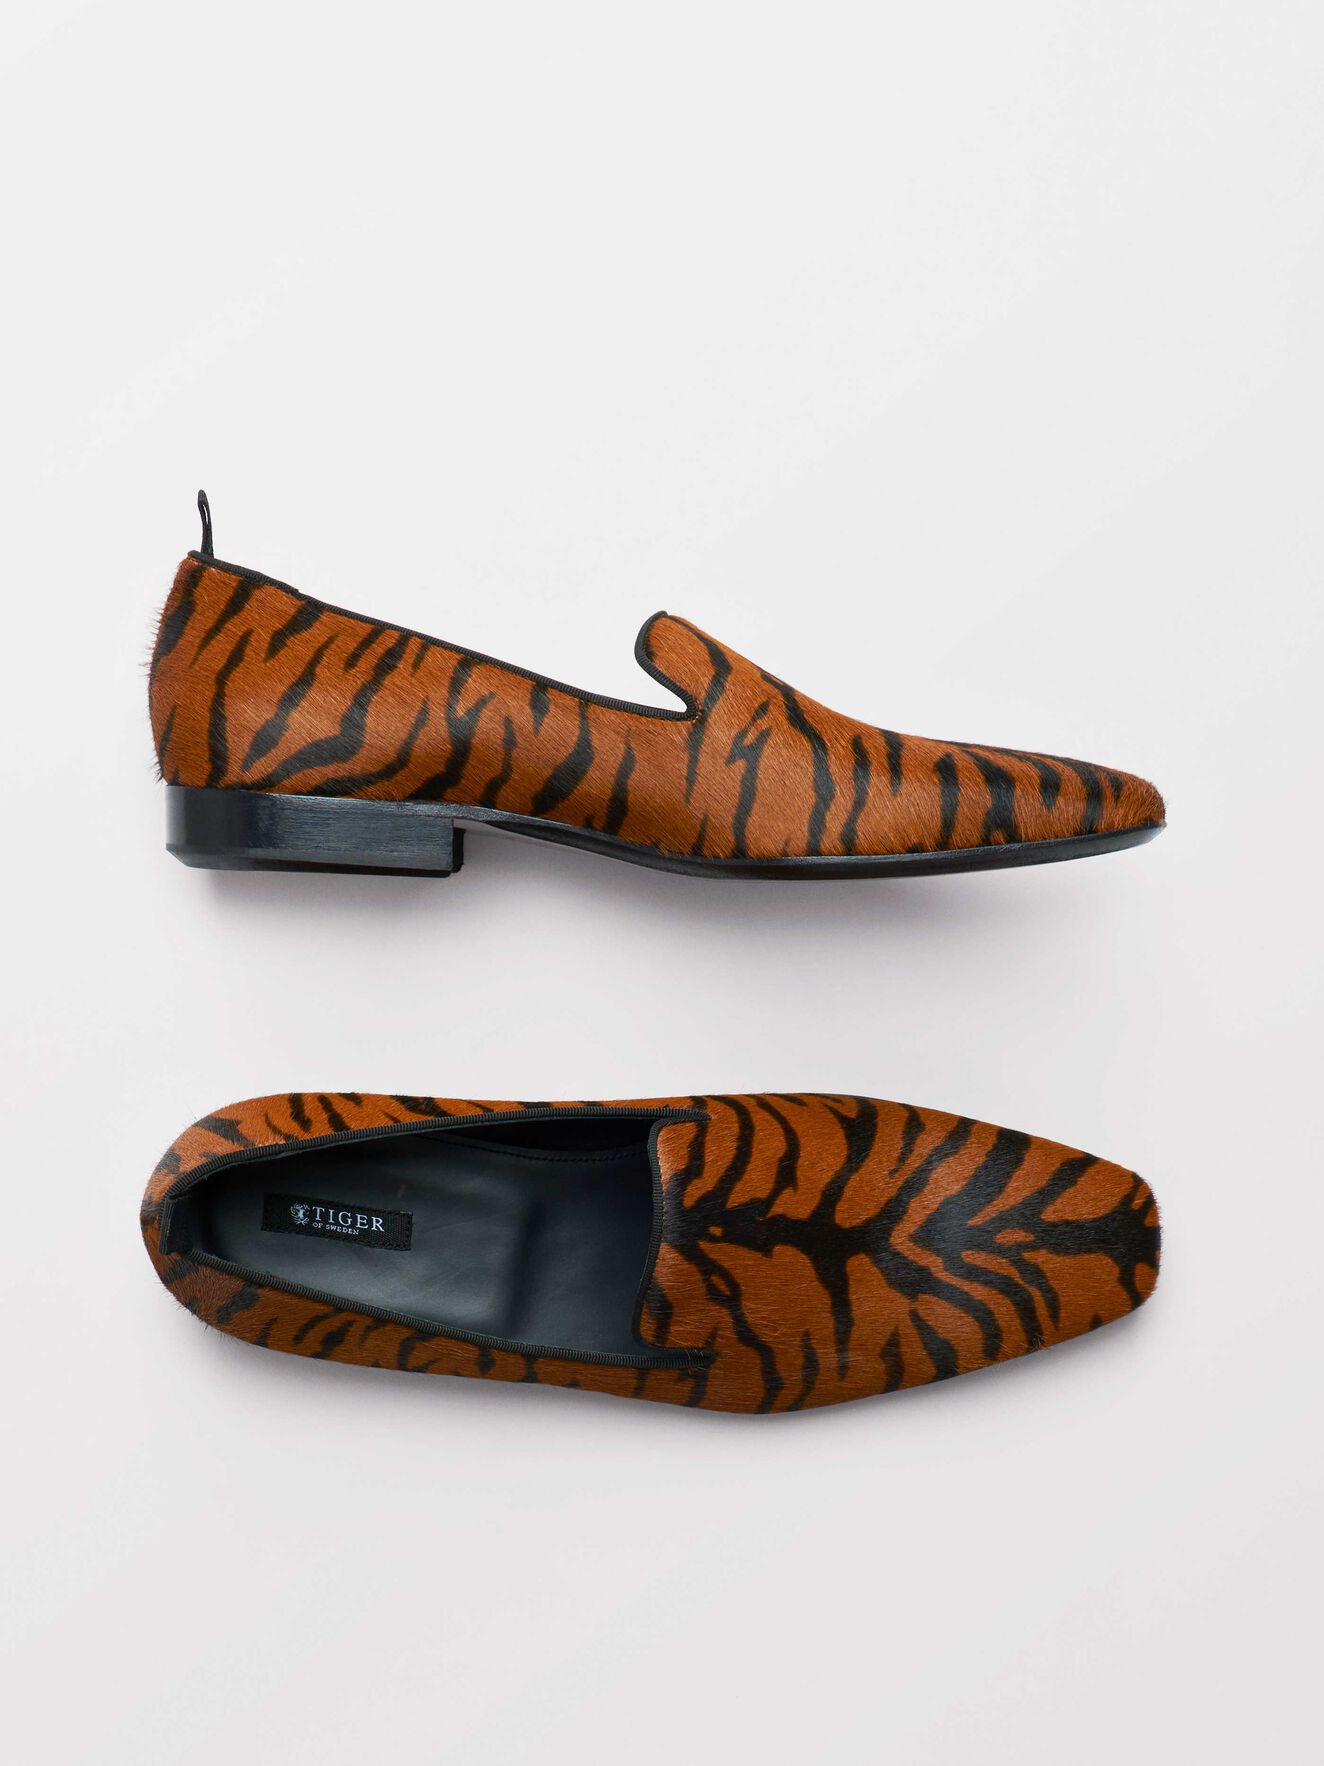 Sartor Loafers in ARTWORK from Tiger of Sweden